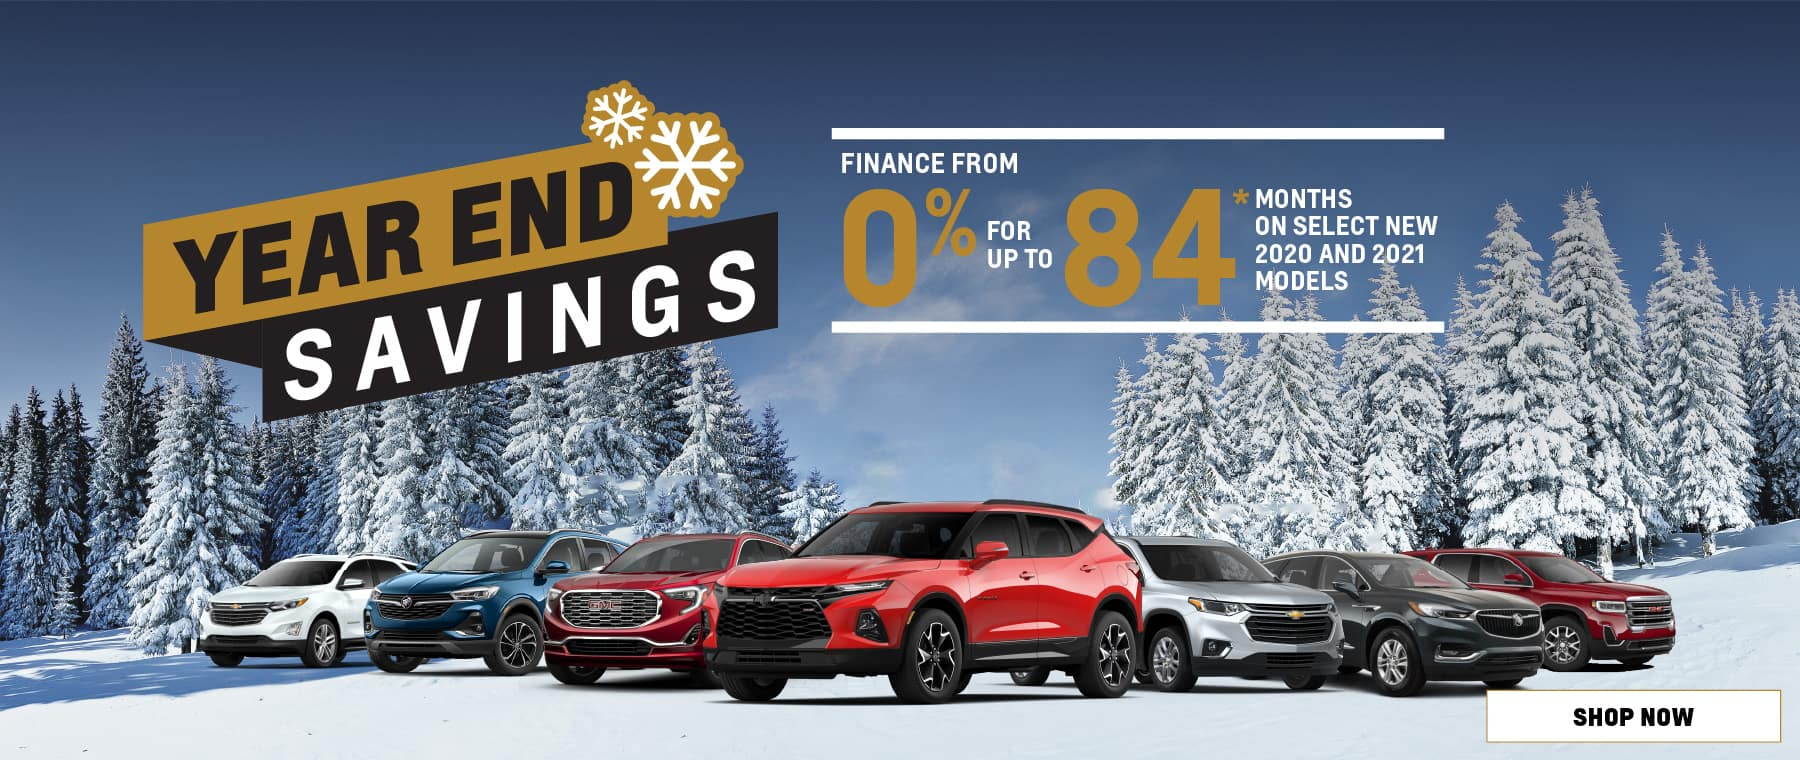 Woodbridge – Year End Savings – CBG – Dealerinspire Banner 1800×760